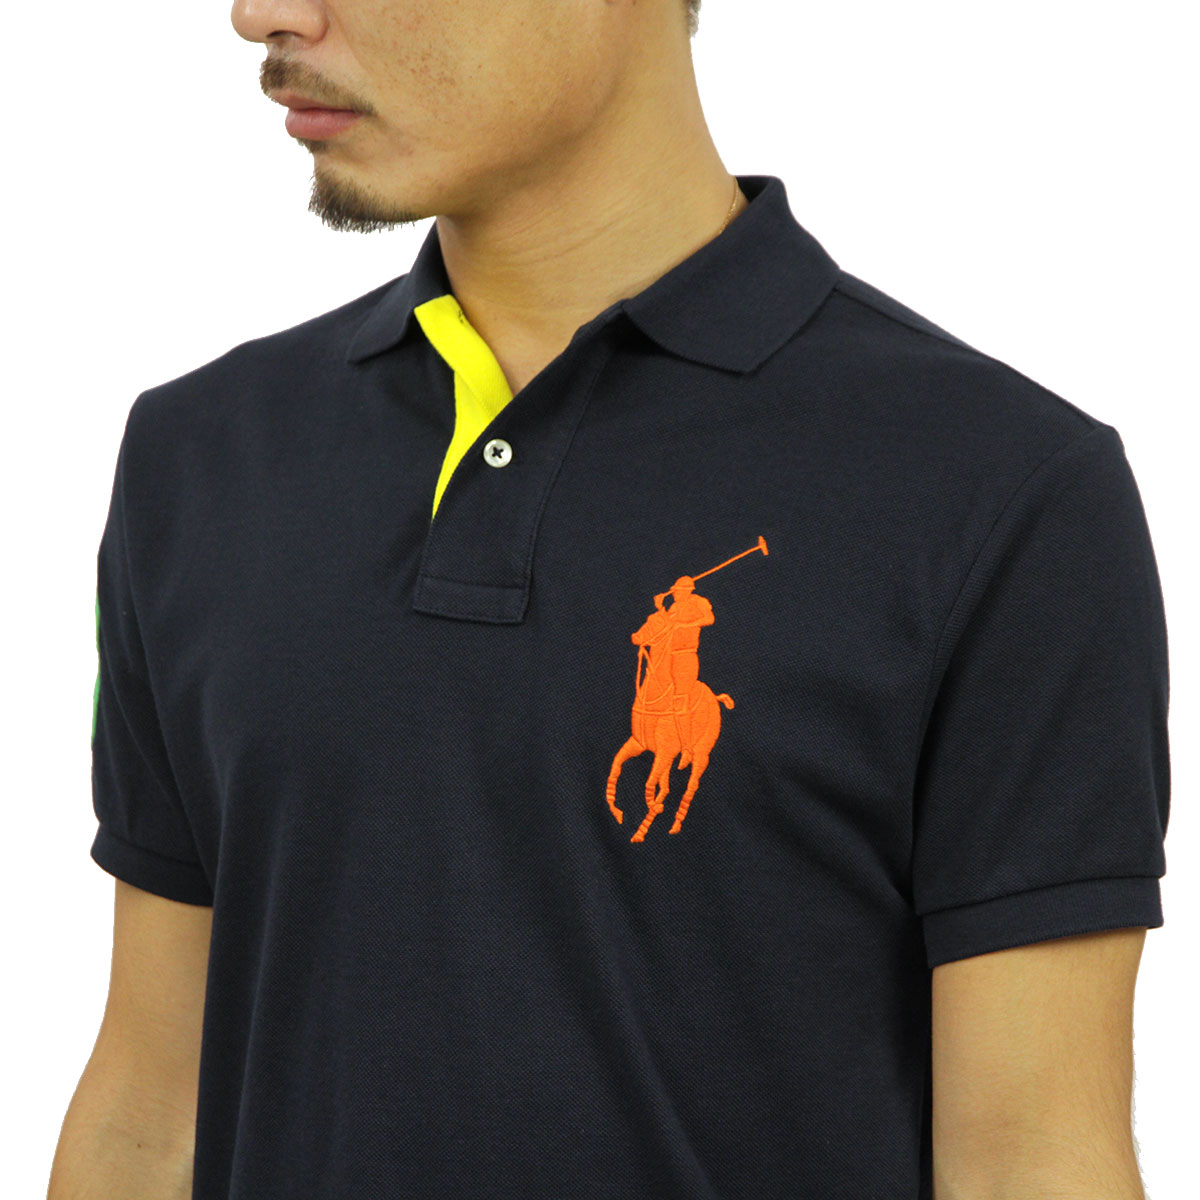 Polo Ralph Lauren POLO RALPH LAUREN genuine mens polo shirt CUSTOM-FIT BIG  PONY POLO